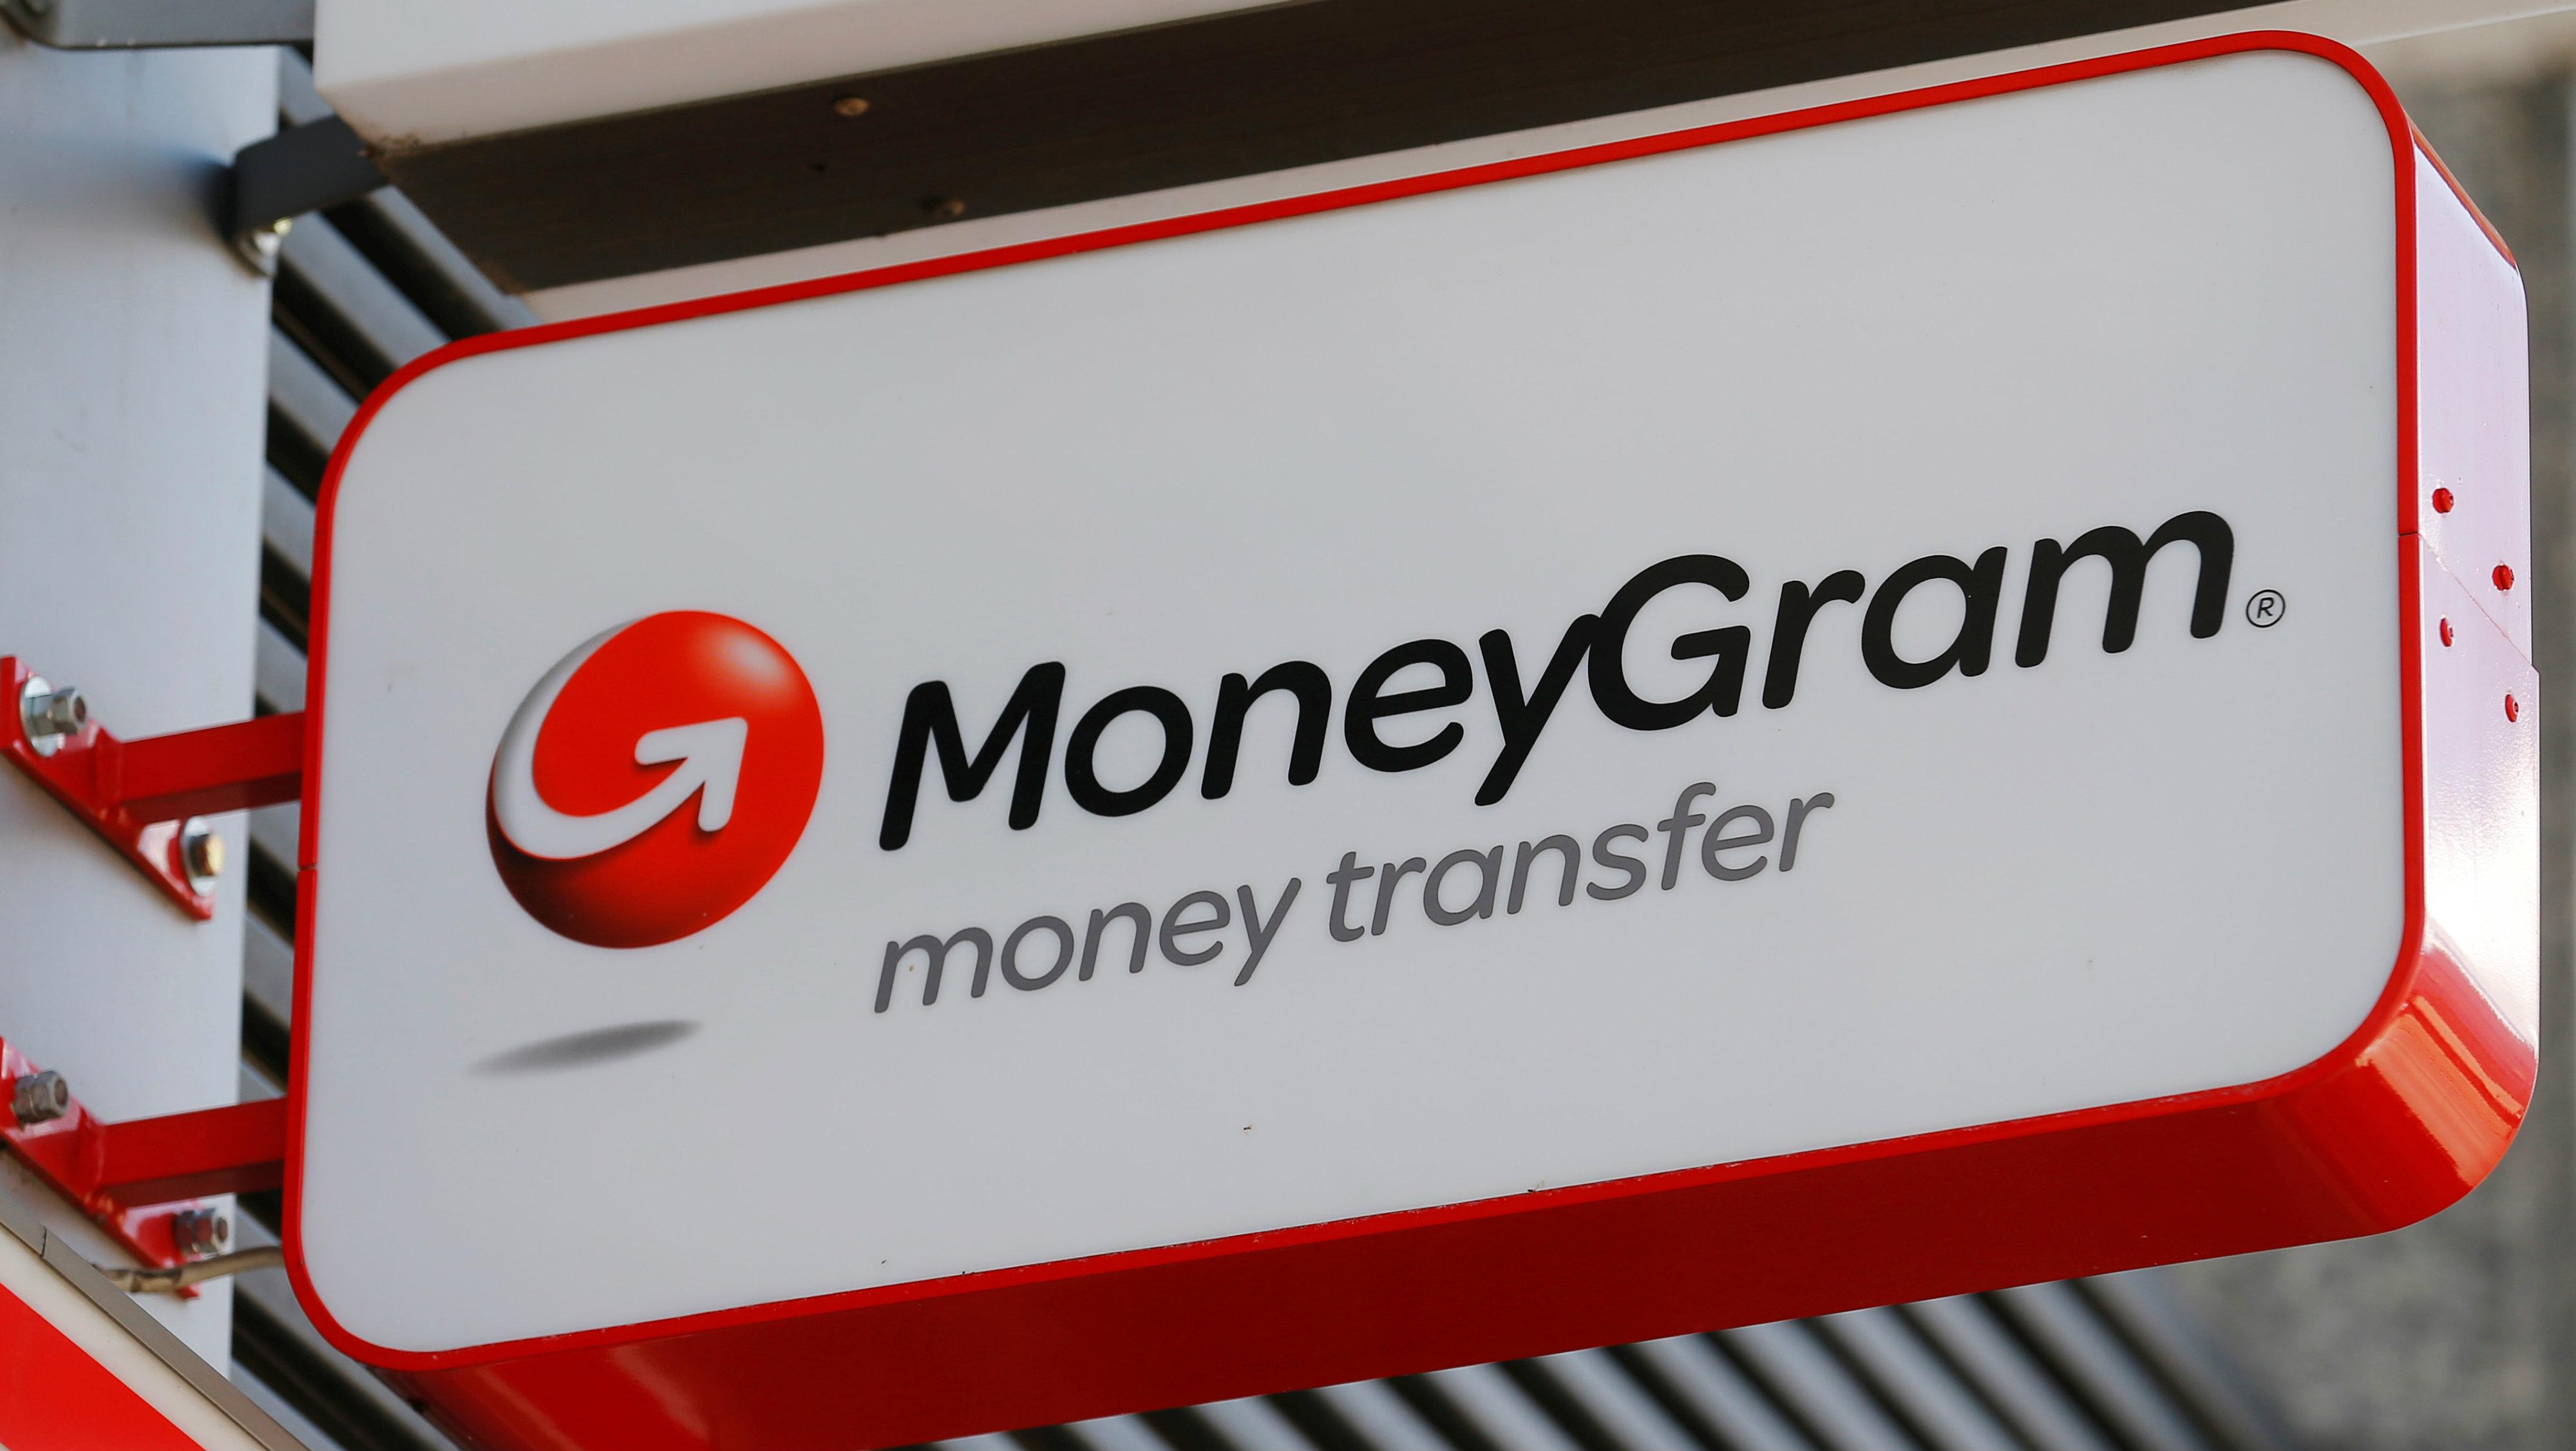 A Moneygram logo is seen outside a bank in Vienna, Austria